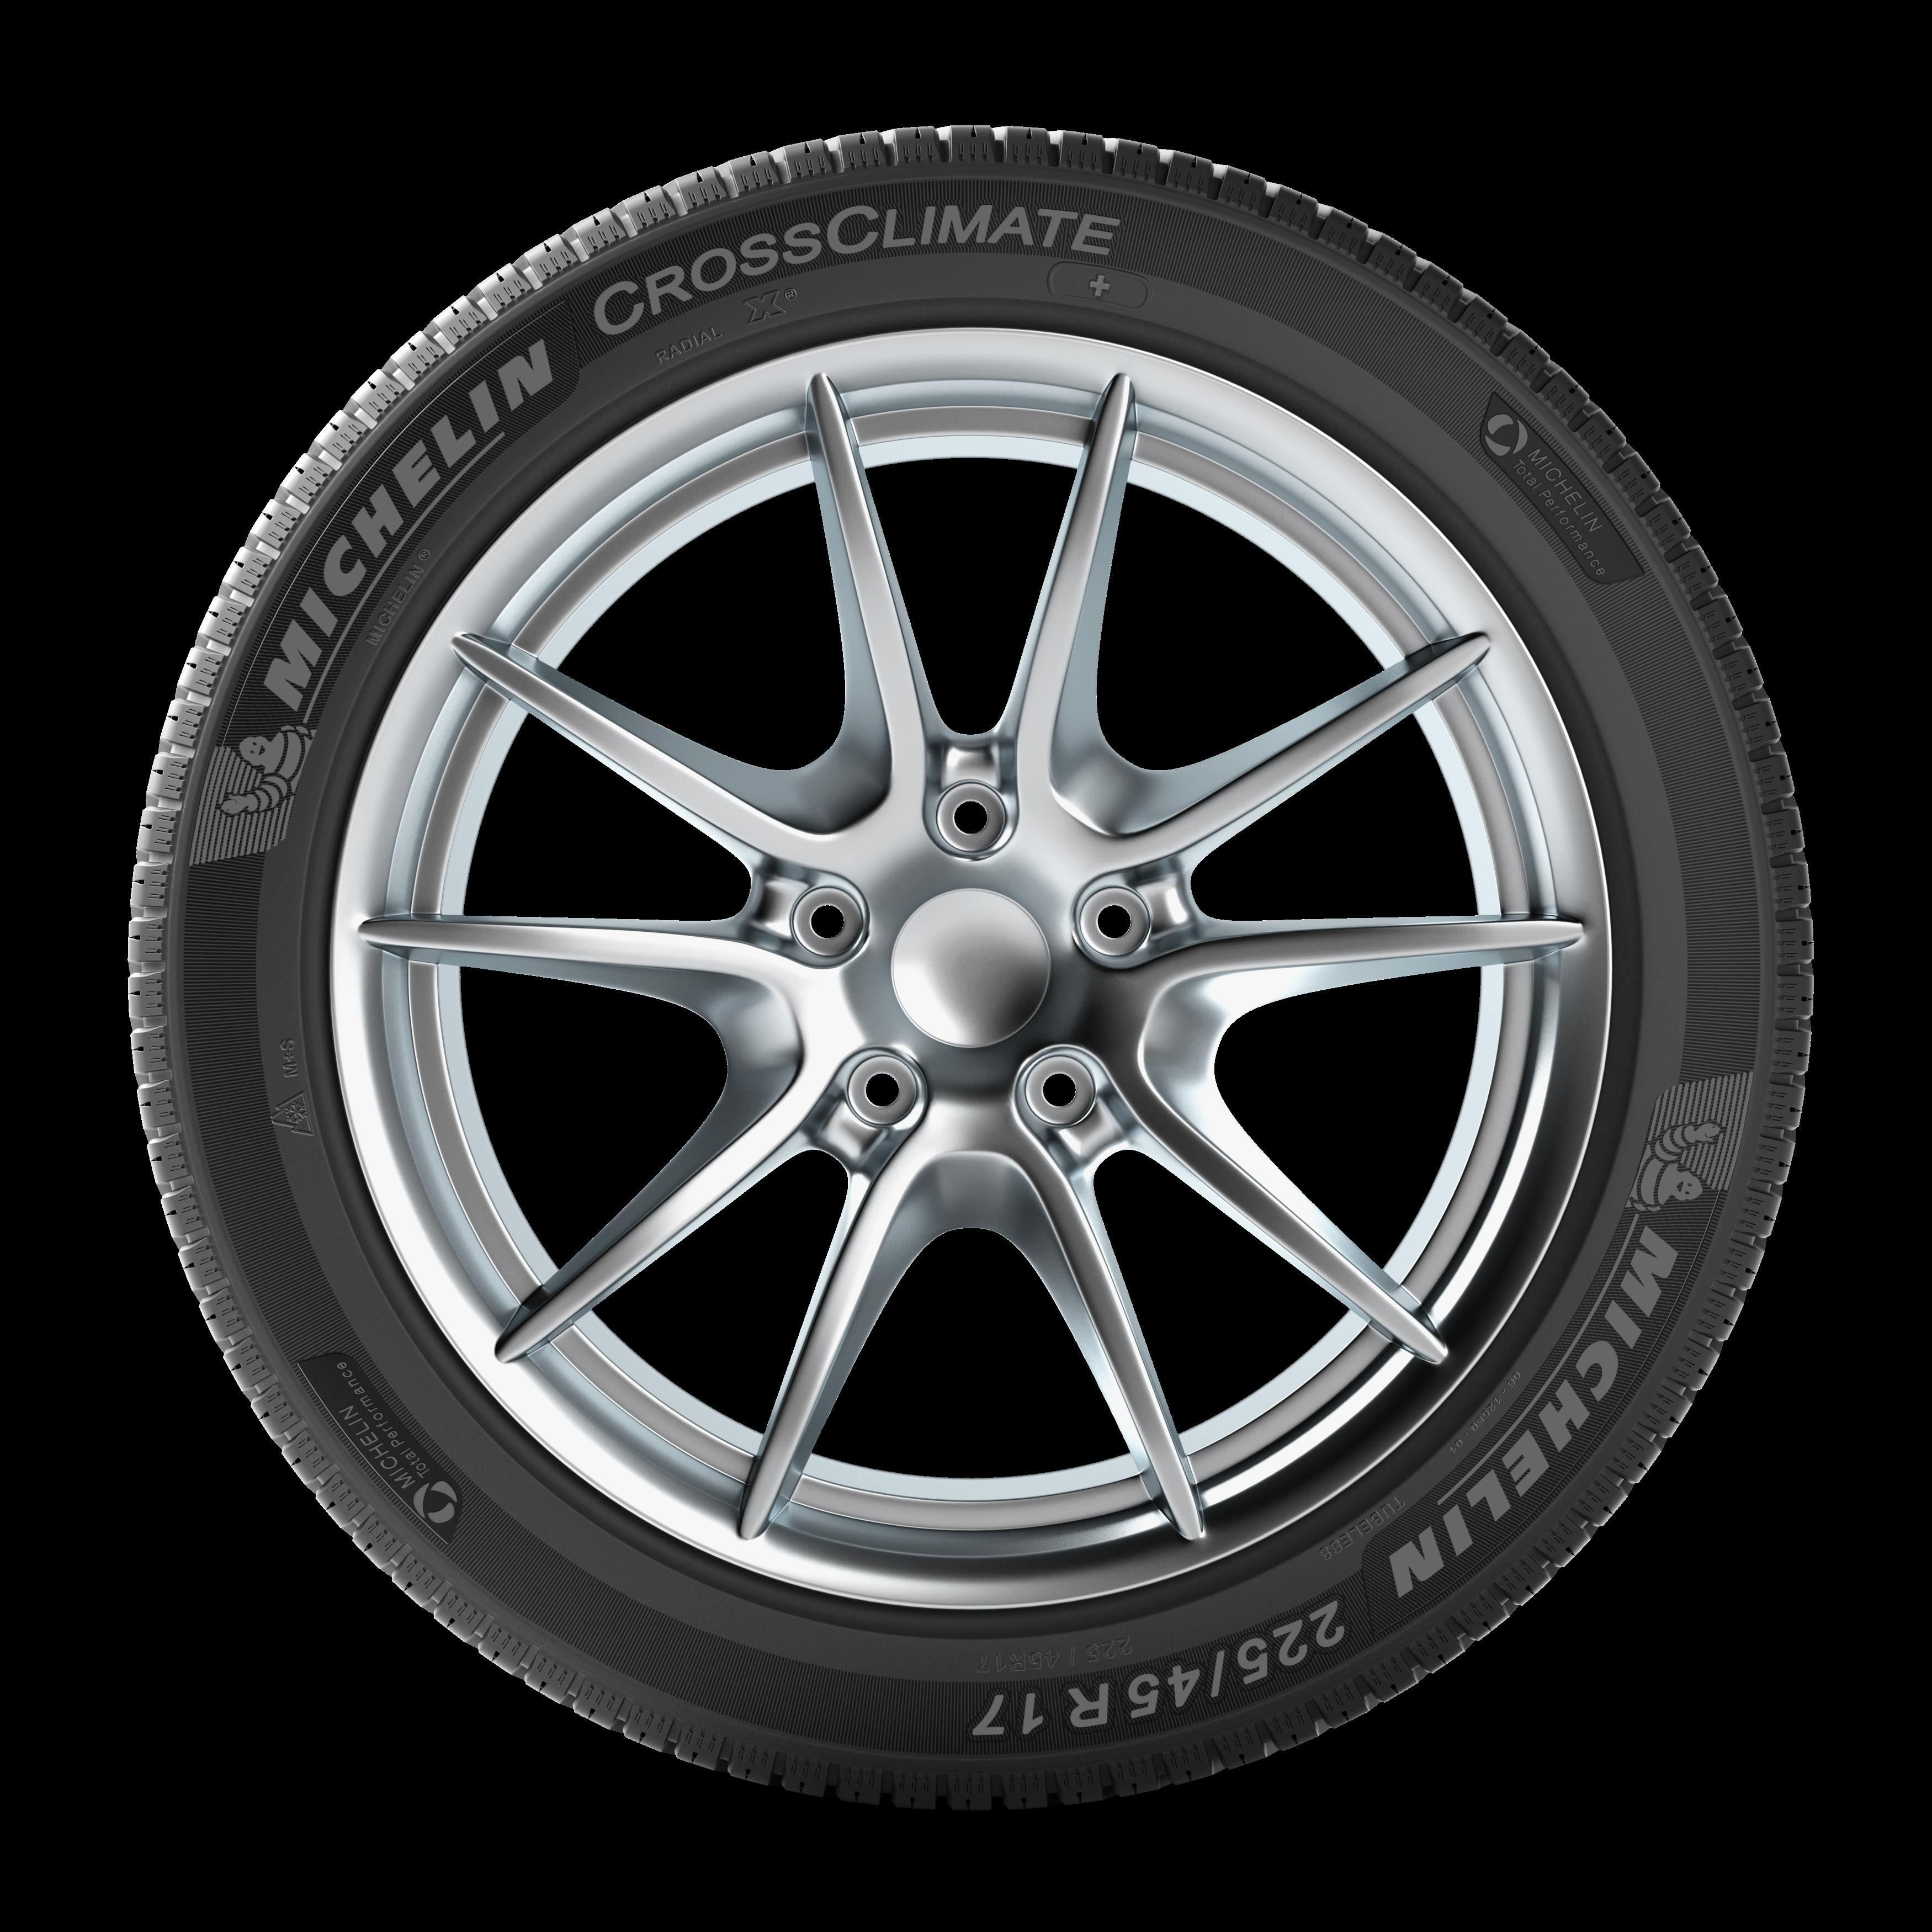 Michelin CrossClimate+ zijaanzicht autobandencheck (1)